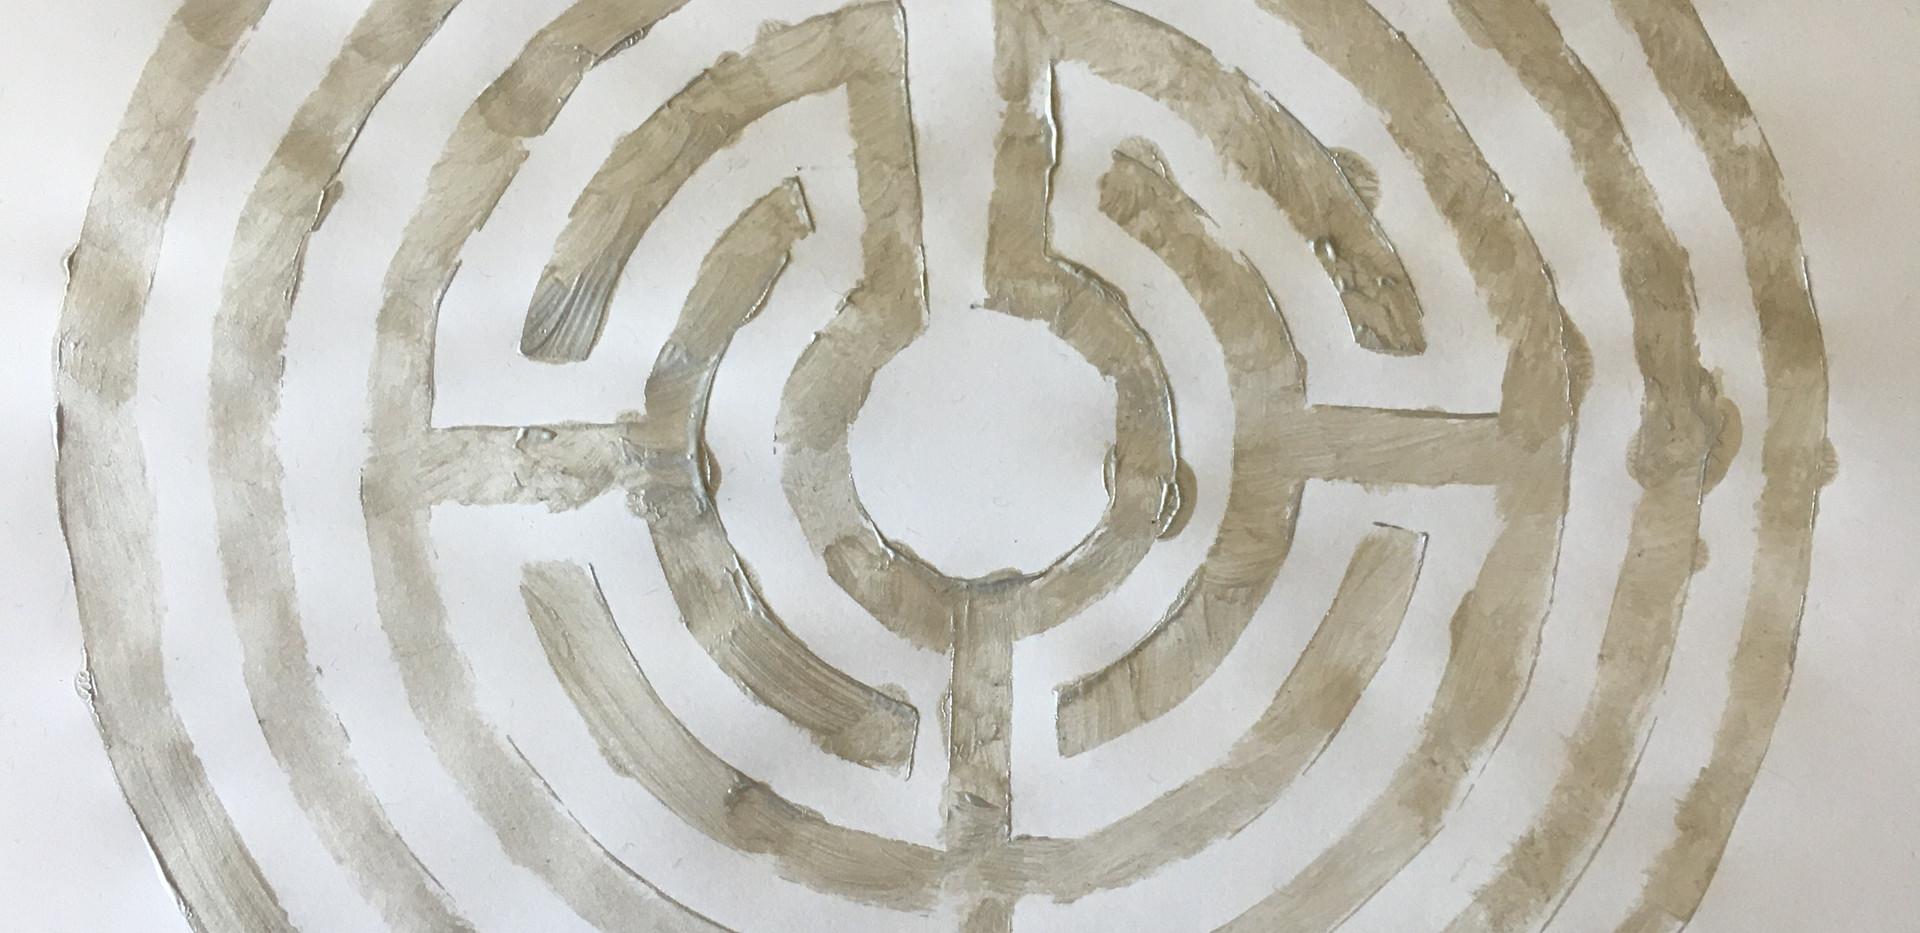 Labyrinth: stencil, 2020